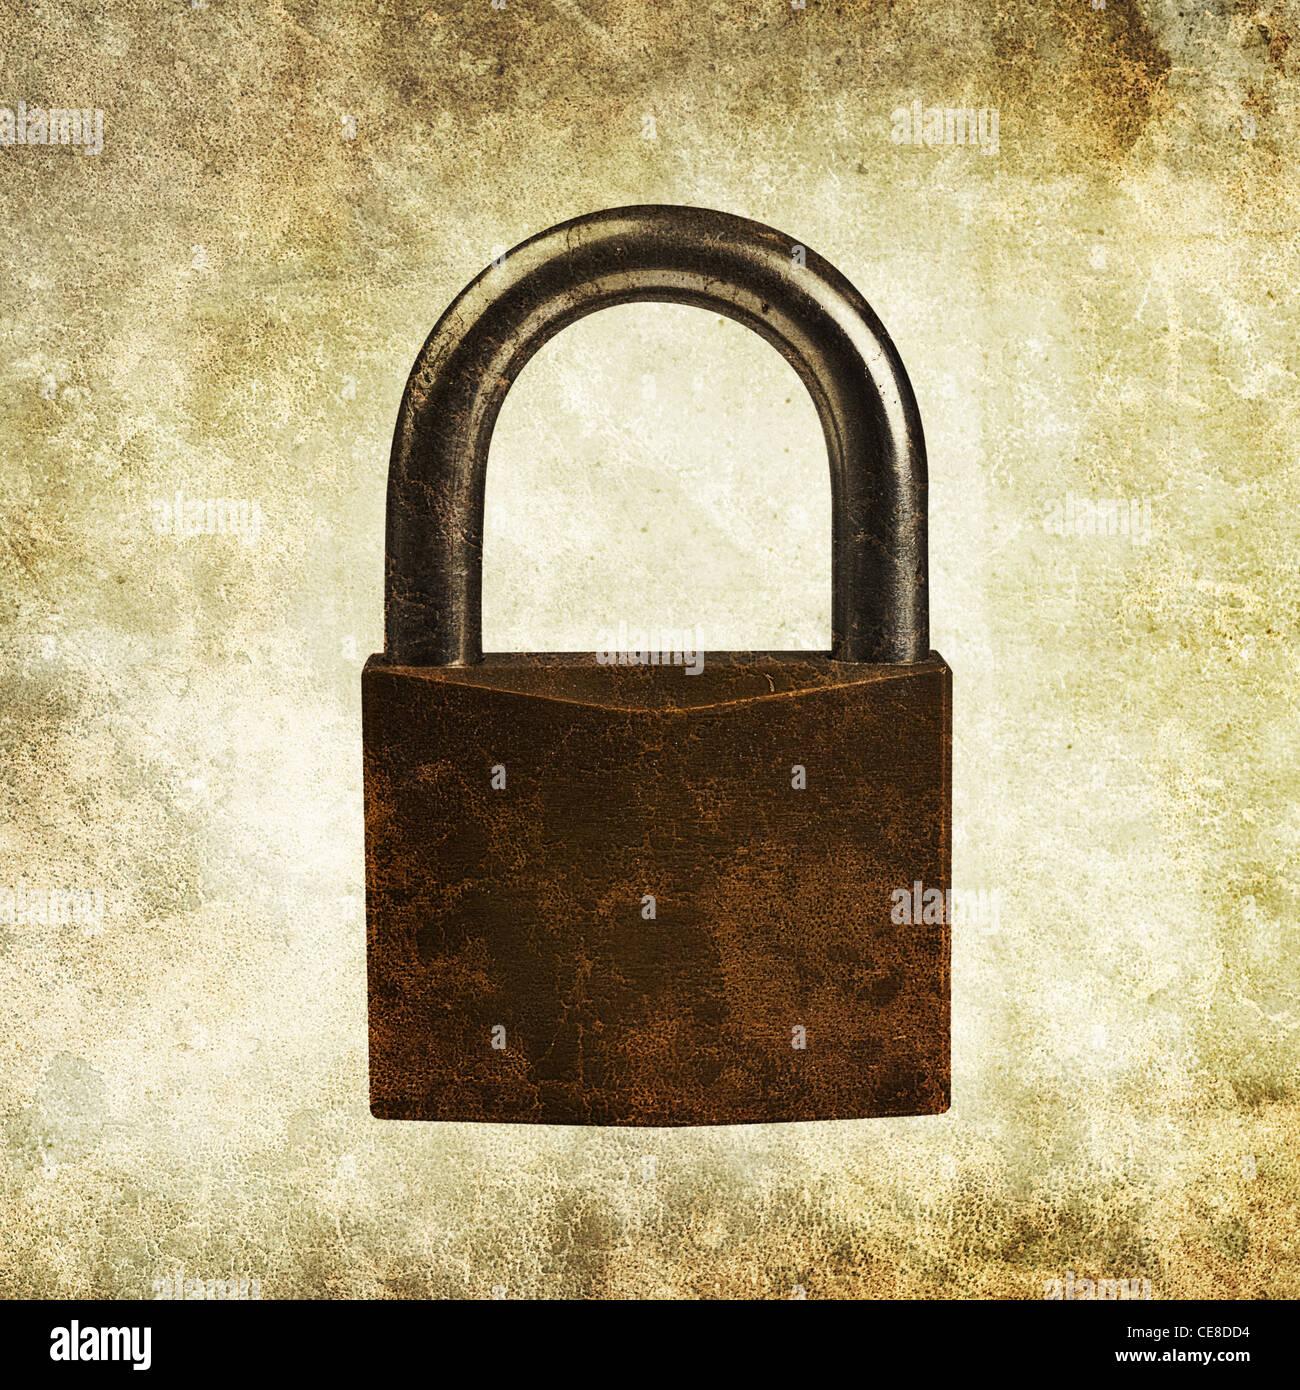 padlock print - Stock Image